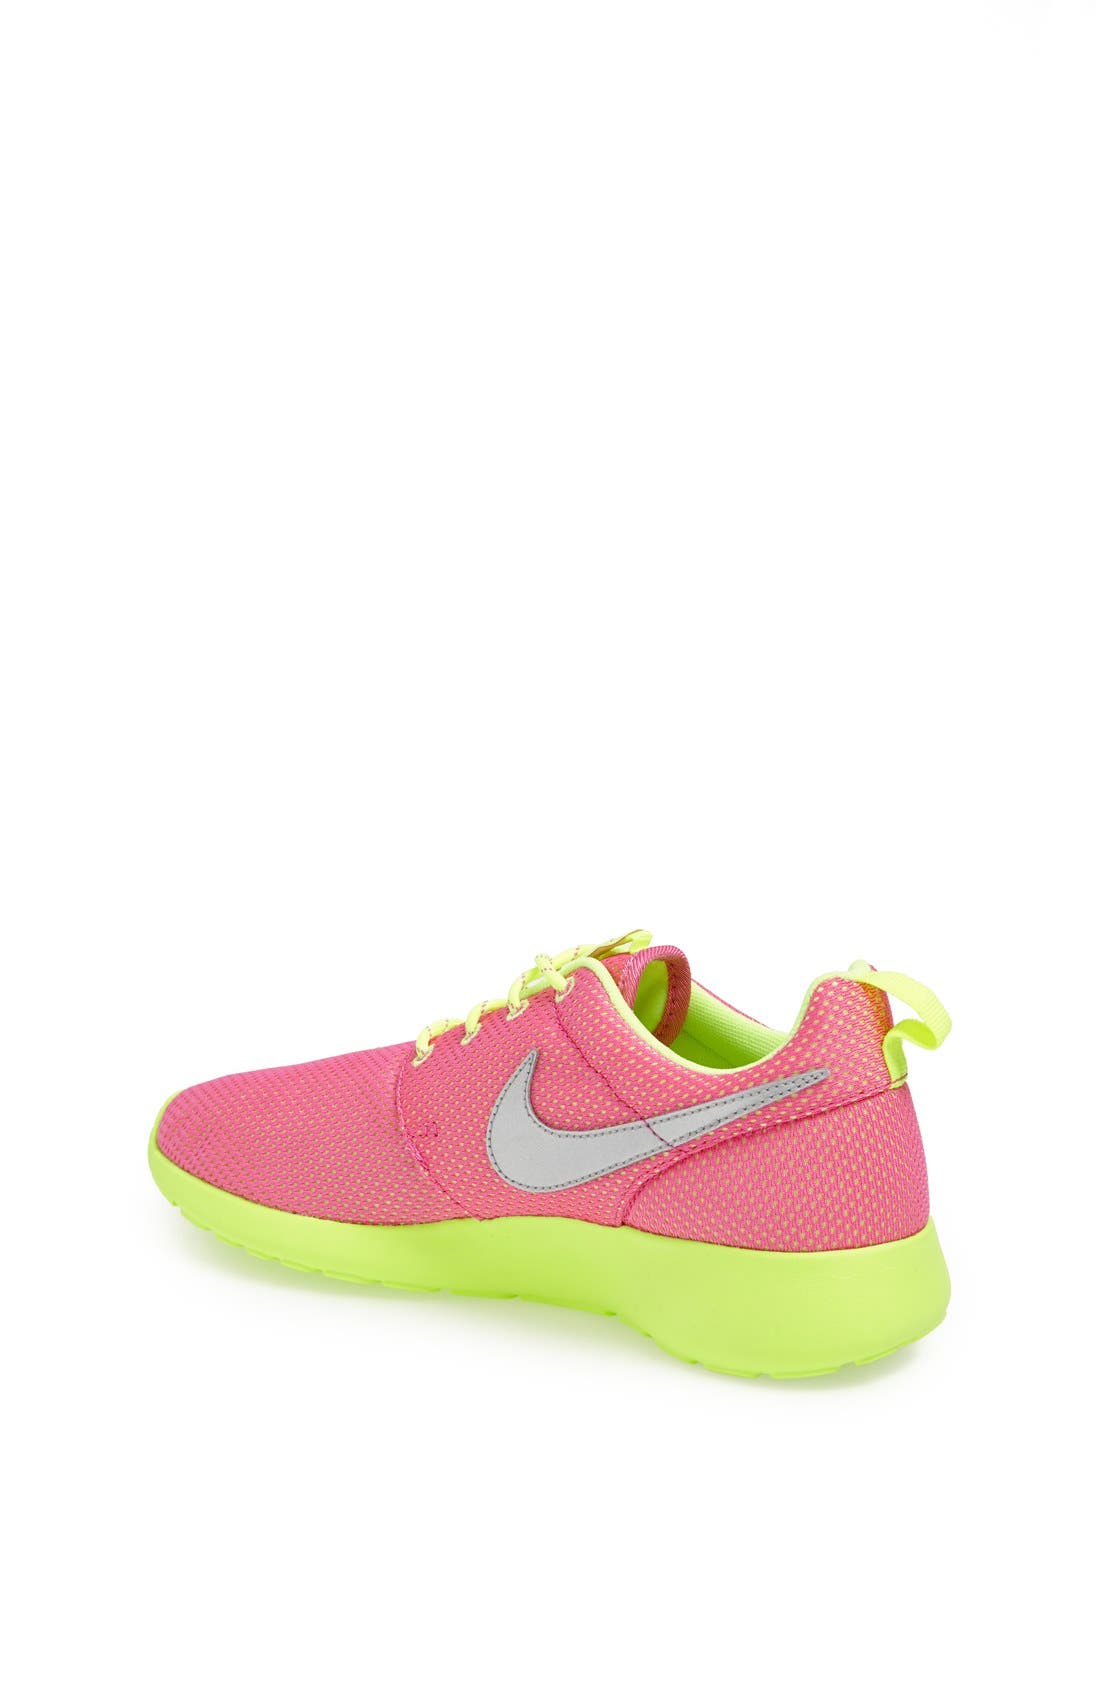 'Roshe Run' Athletic Shoe,                             Alternate thumbnail 139, color,